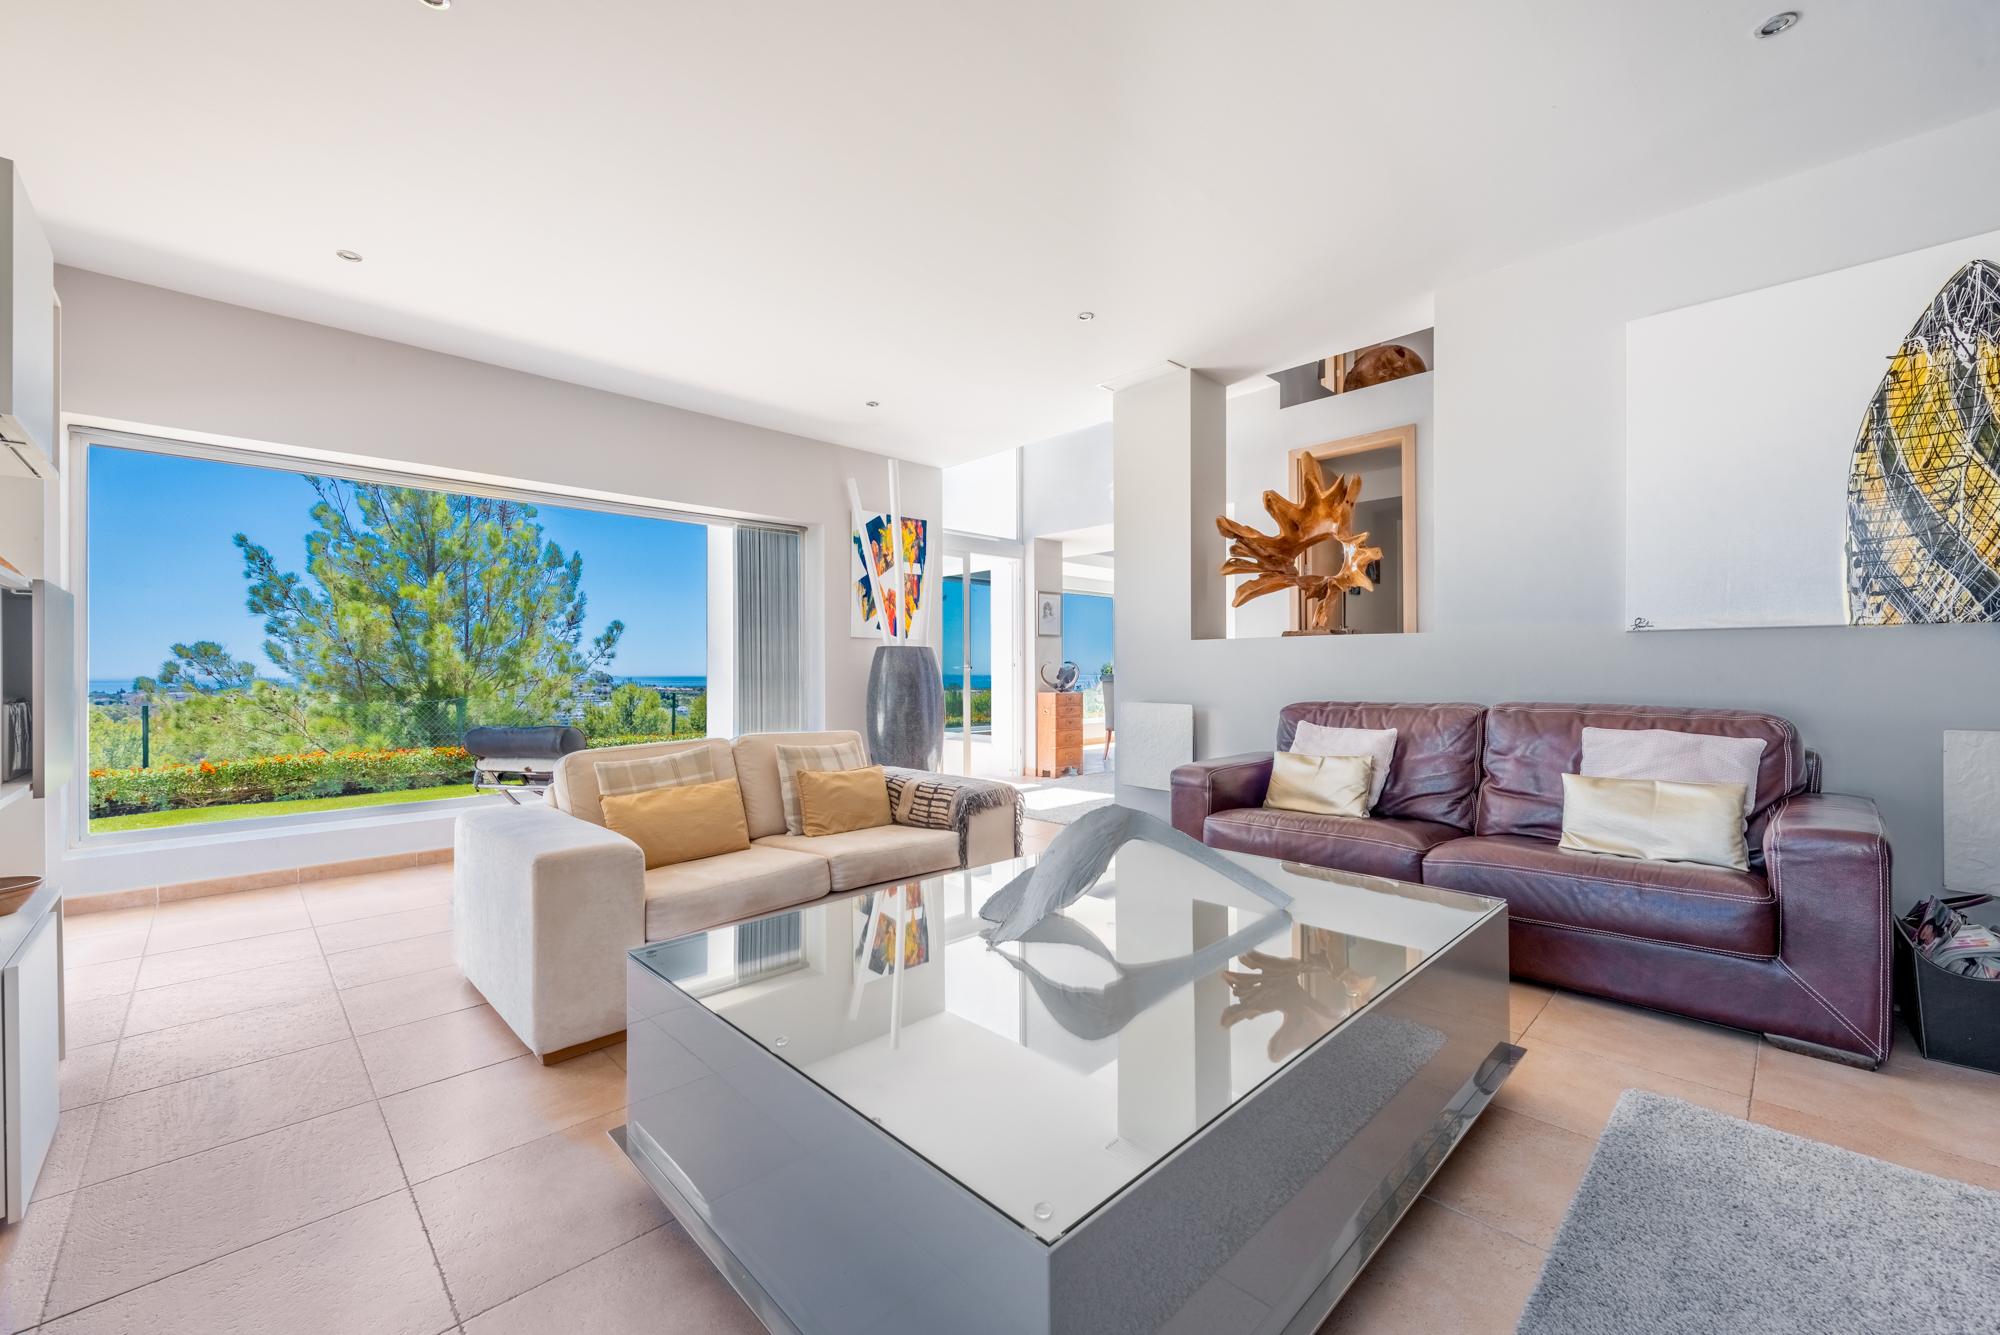 benahav s haus 4 schlafzimmer 247 m mimove. Black Bedroom Furniture Sets. Home Design Ideas